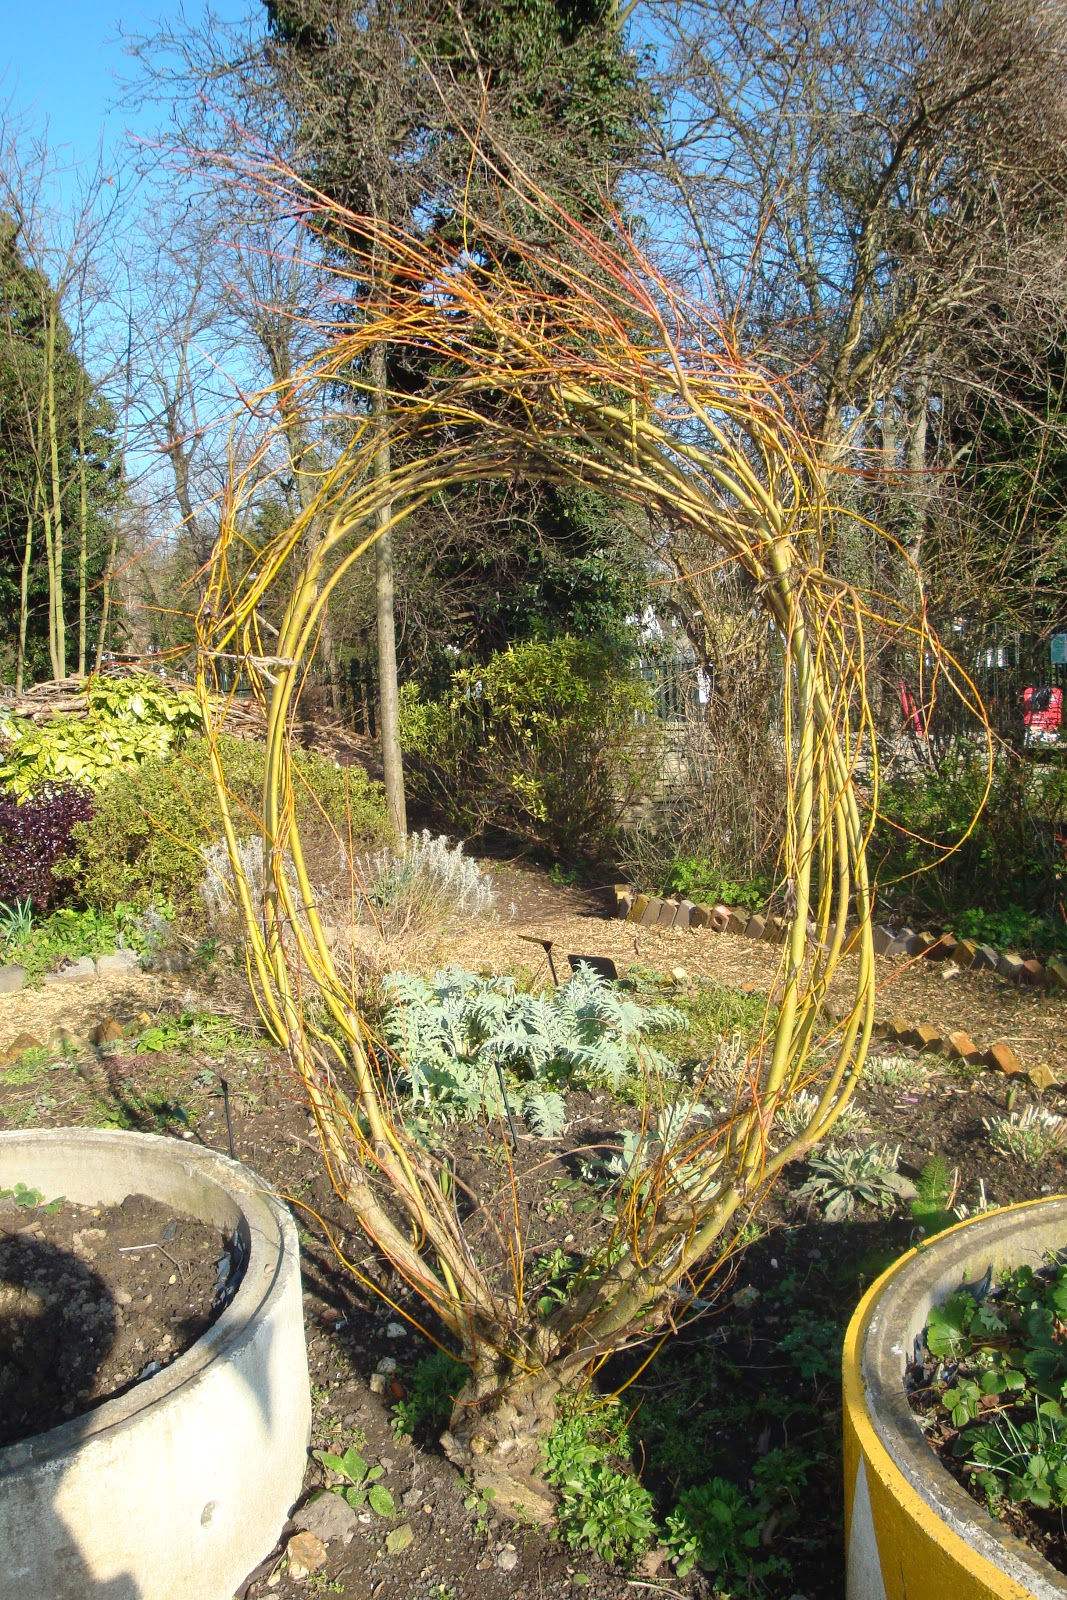 Out2play in the garden: Community Garden at Dean City Farm